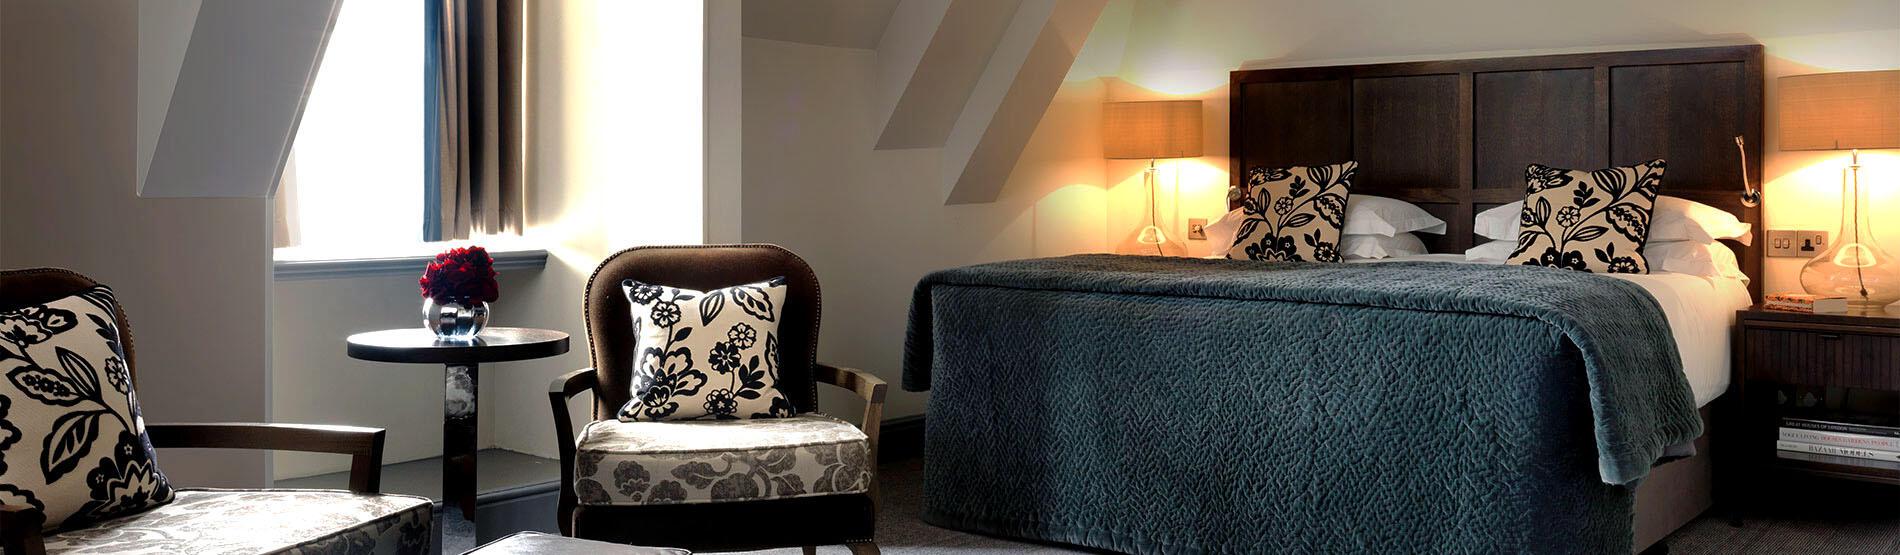 home rooms chambre deluxe avec 1 lit queen size - Lit Queen Size